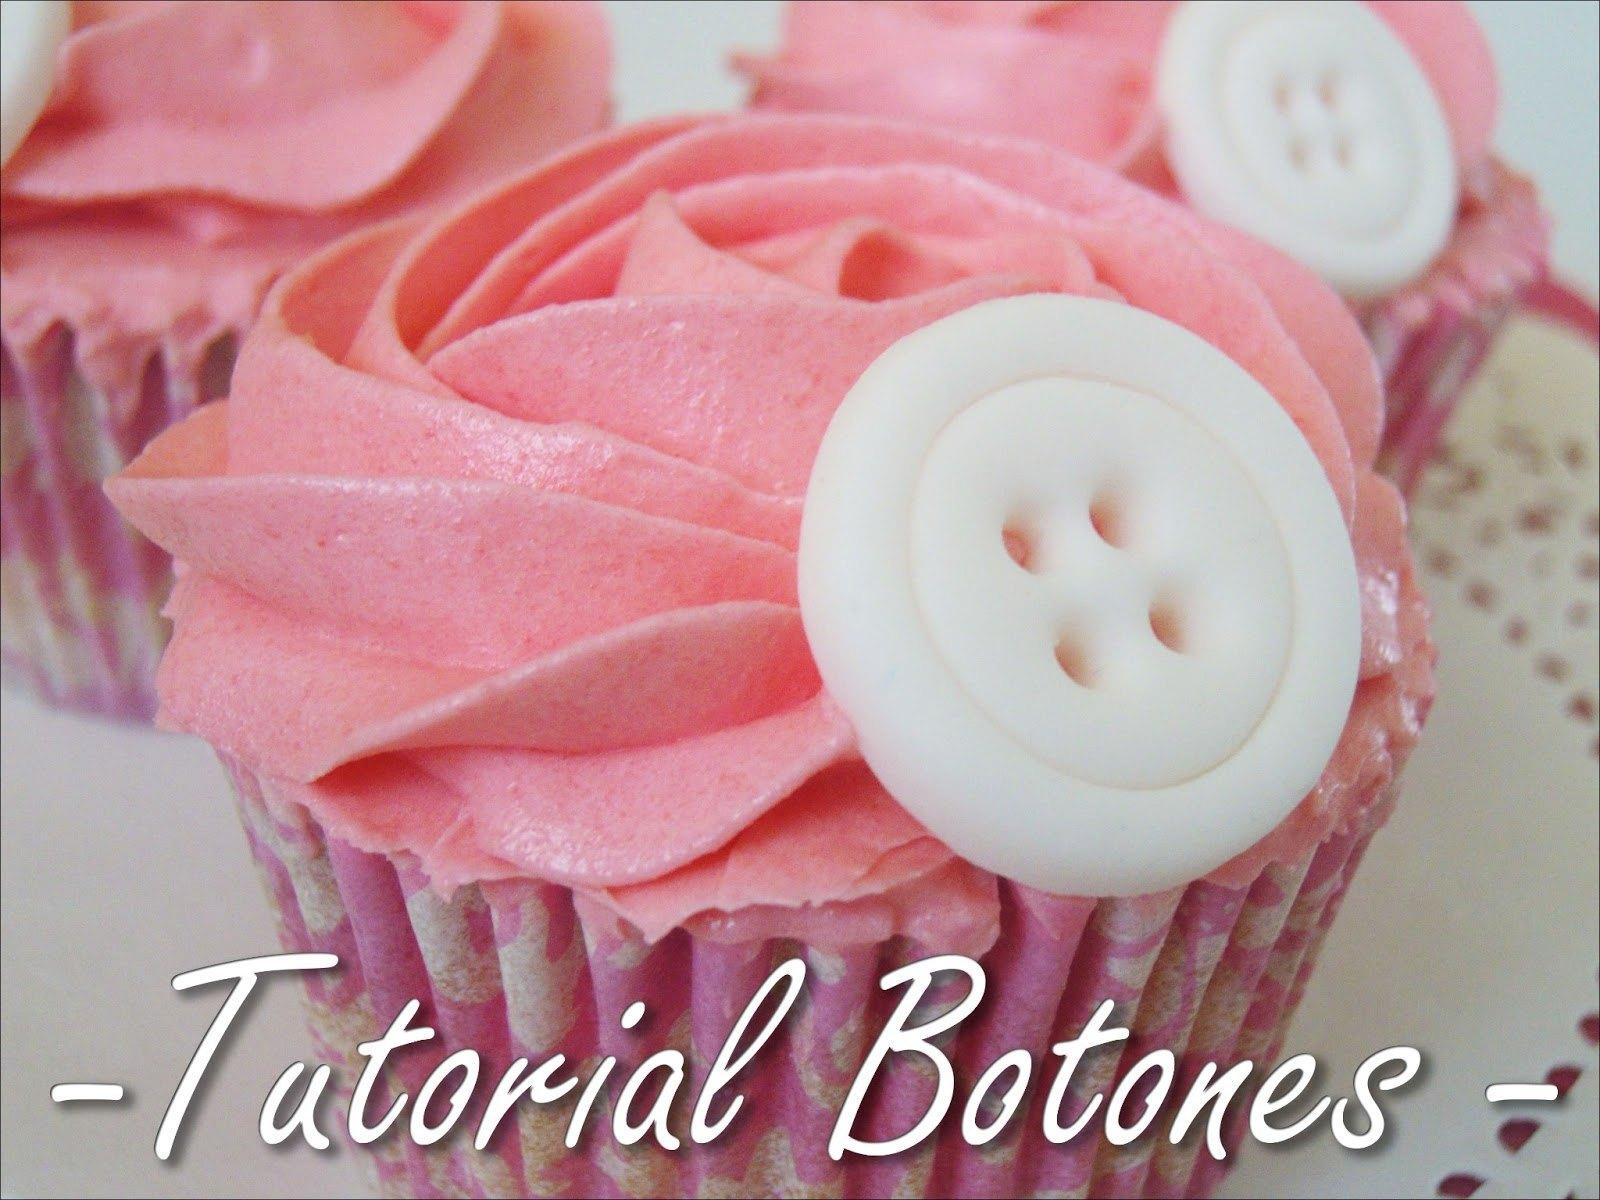 2dc3e dscn8762 - Pon tu Toque personal al CandyBar: Recetas de Cupcakes